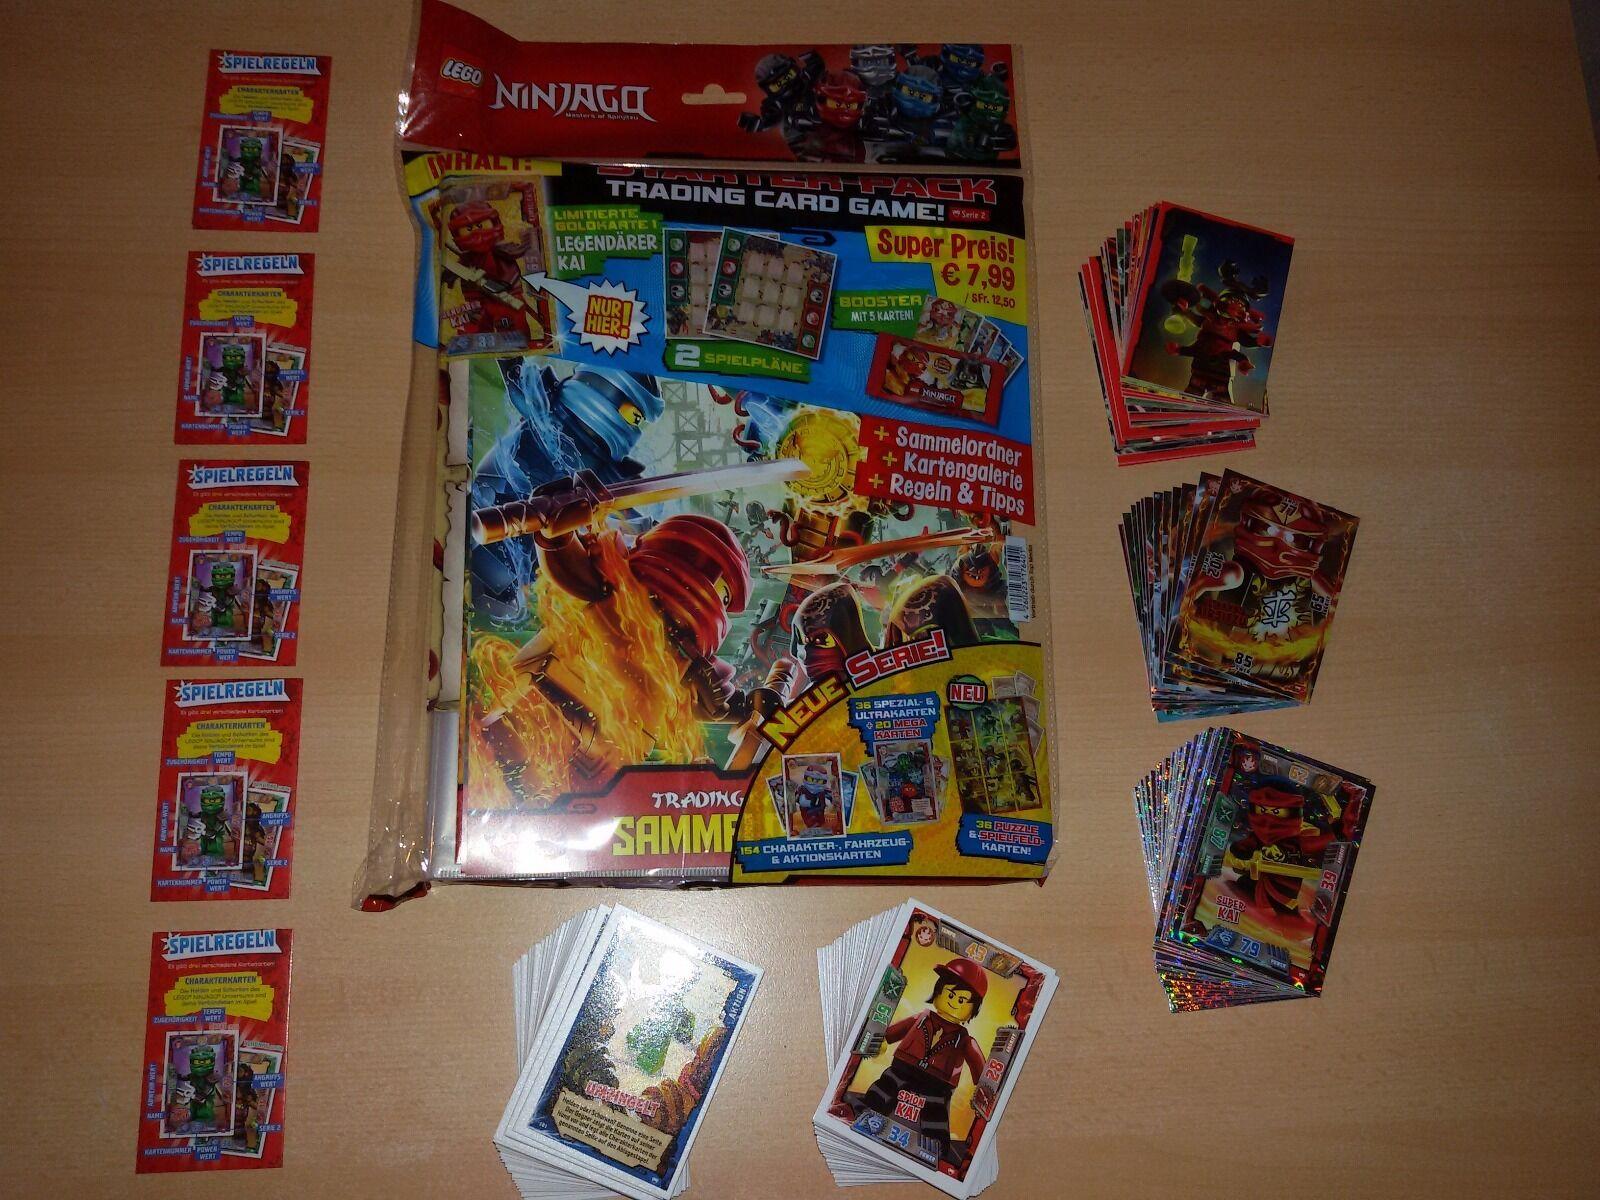 Lego Ninjago Trading Cards Serie 2 Sammelmappe mit 218 Karten  ...nagelneu...